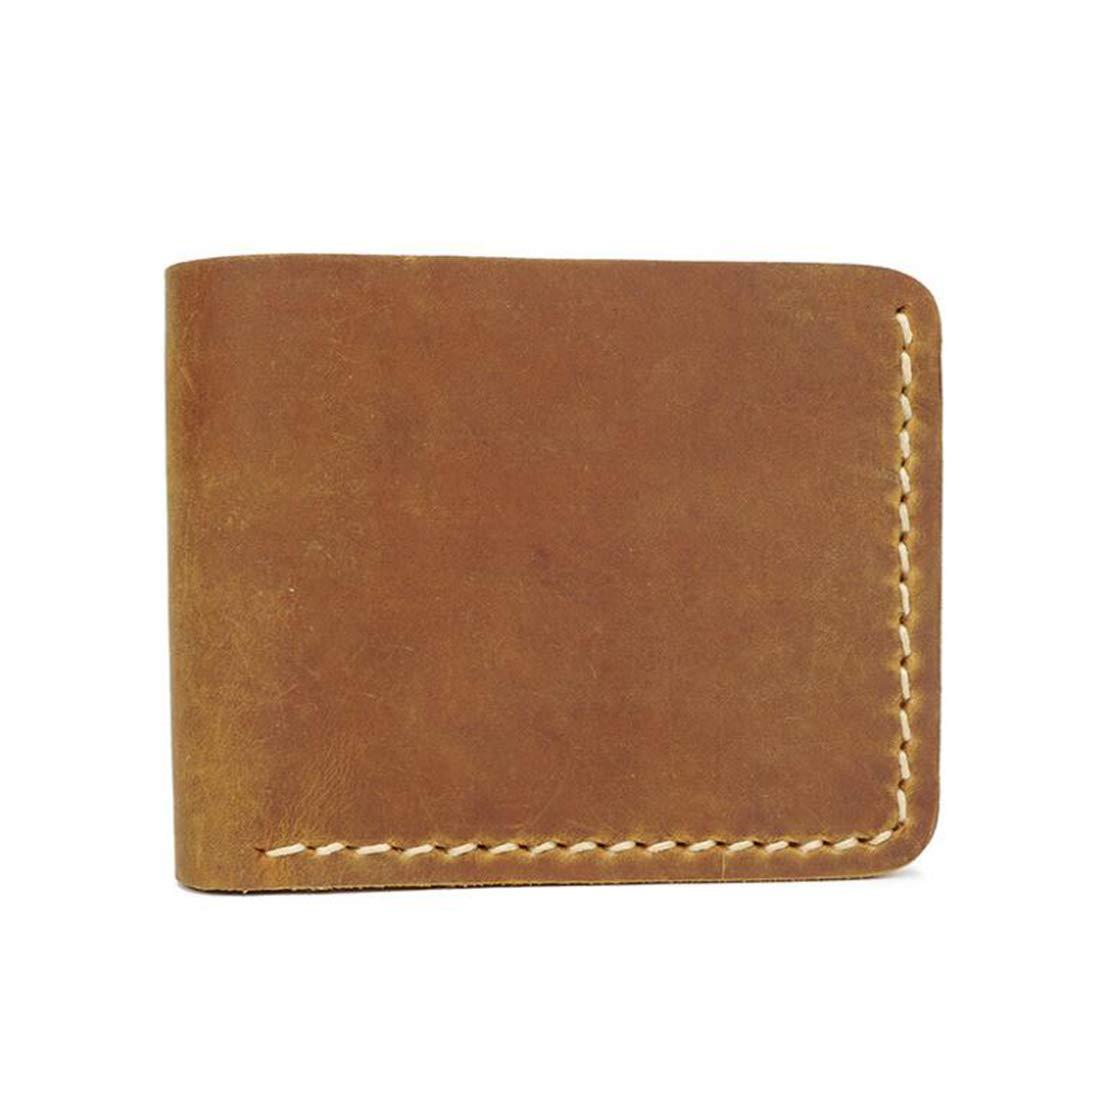 CEFULTY Mens Genuine Leather RFID Blocking Bifold ID Wallet Slim Credit Card Holder Minimalist Color : Brown1